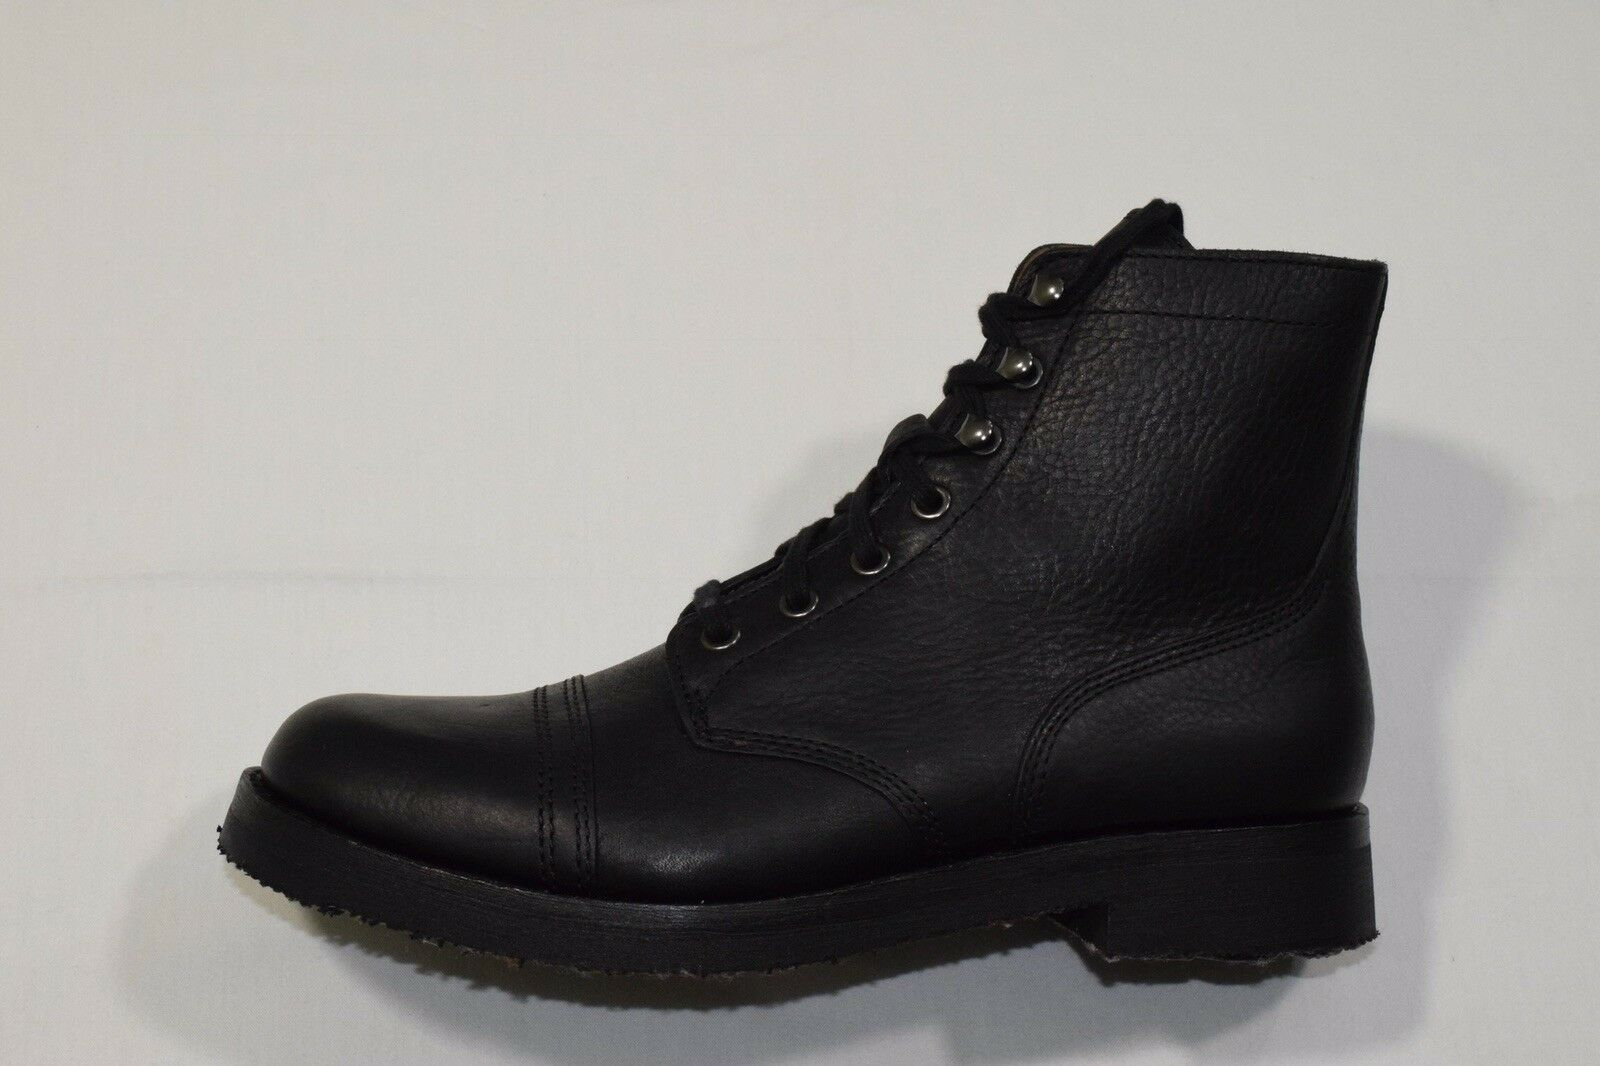 Polo Country Ralph Lauren Enville Cap Toe Leather Boots Mens 9.5D